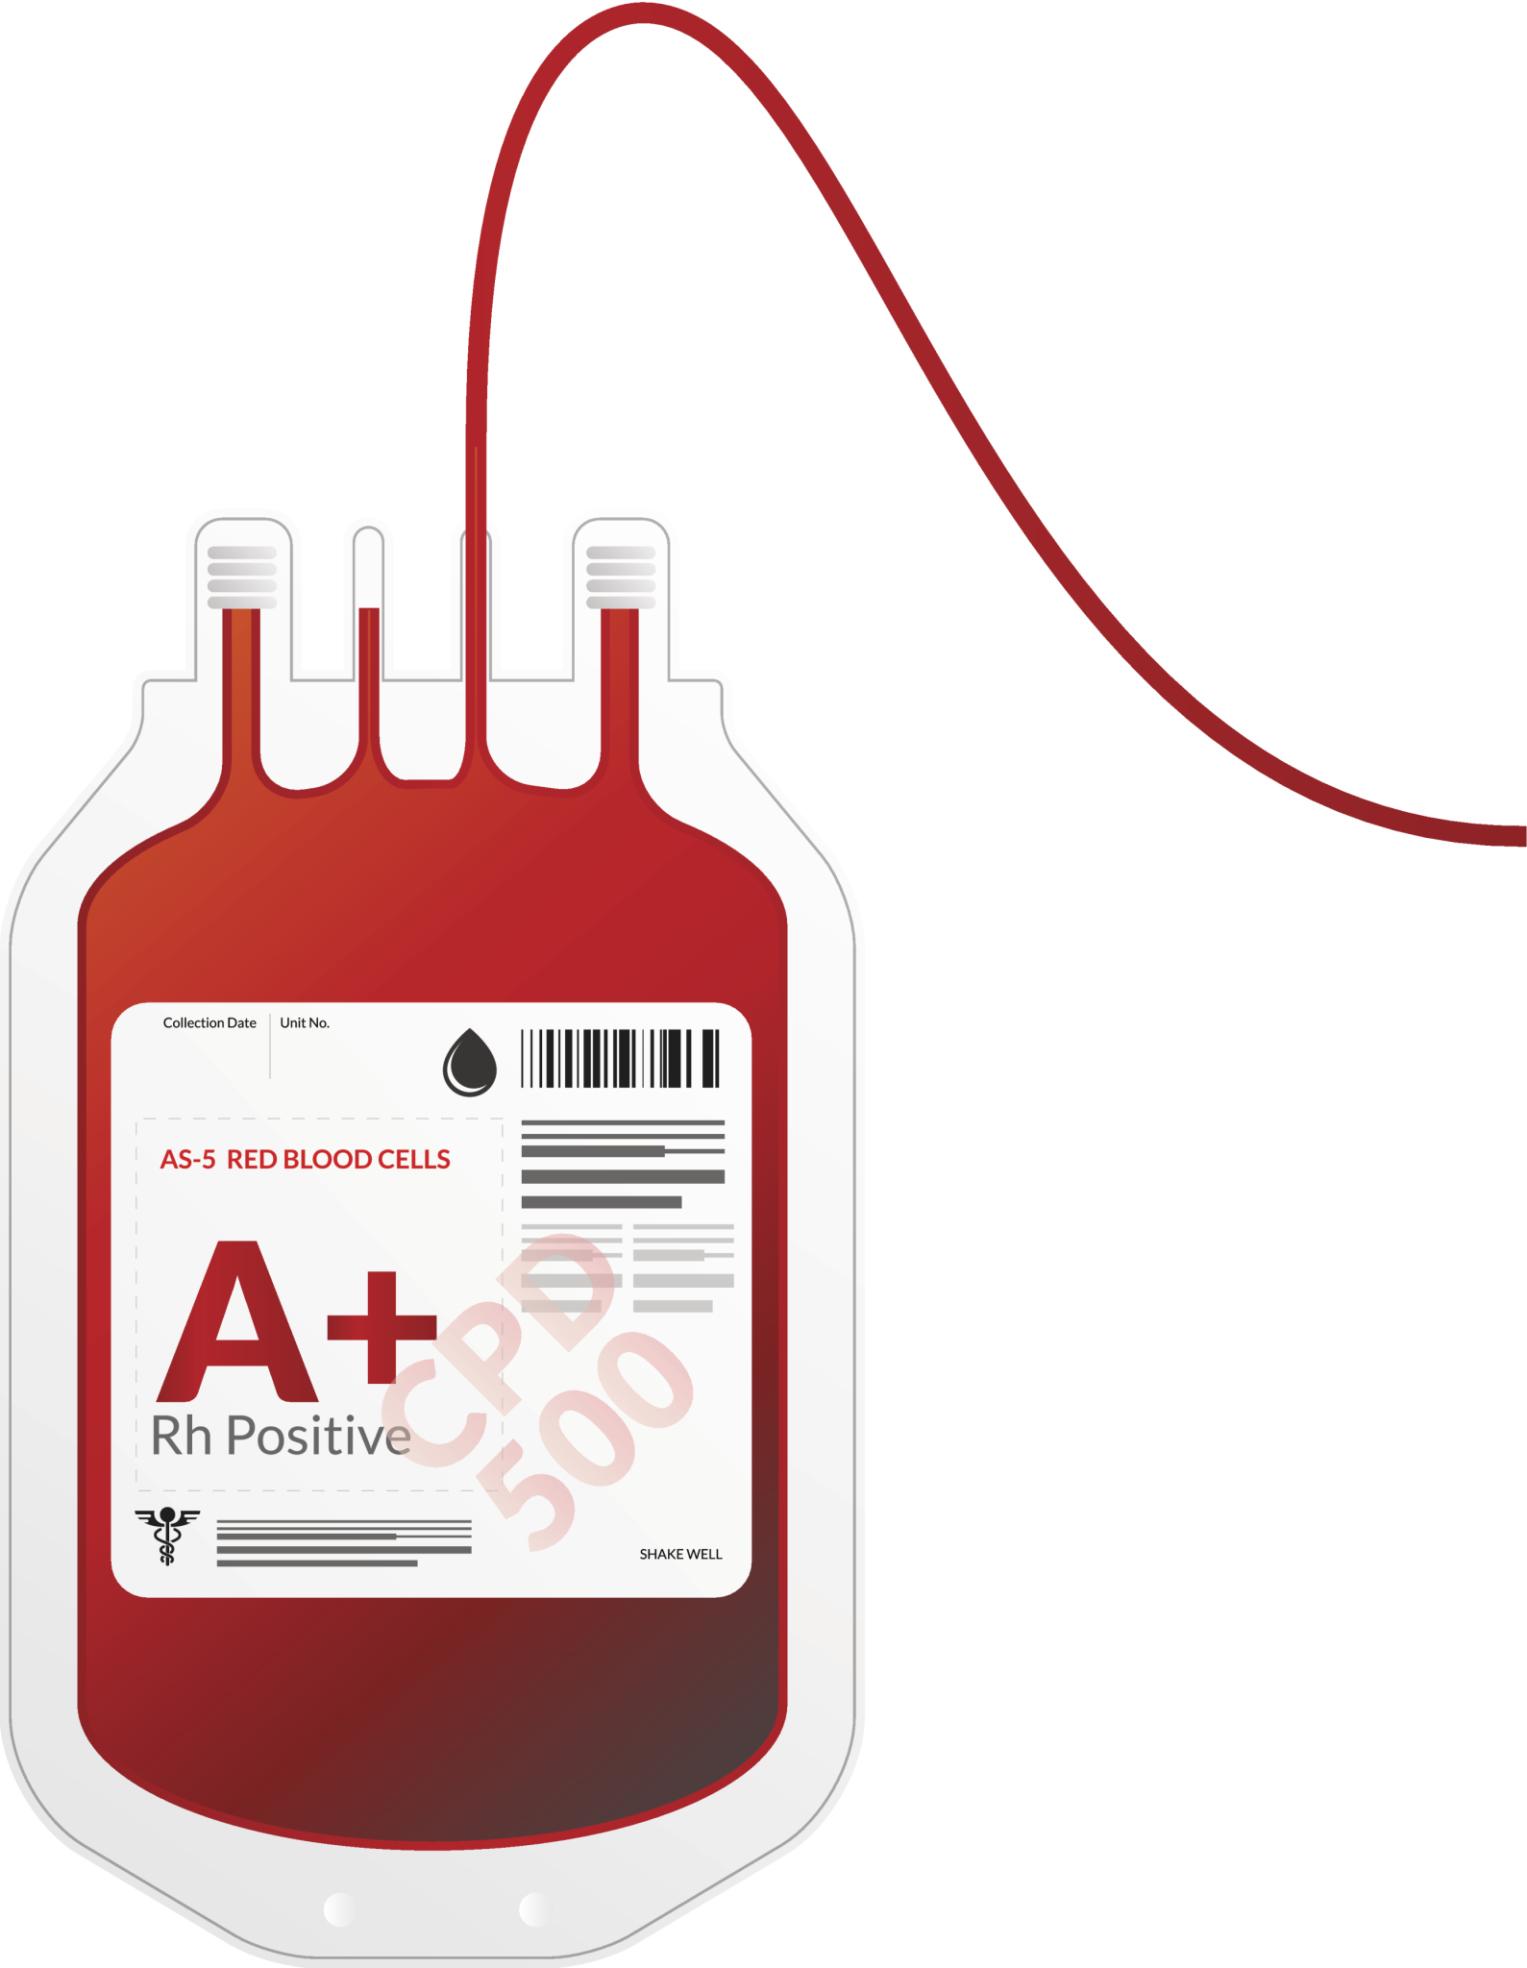 Blood Donation Bag PNG - 144781